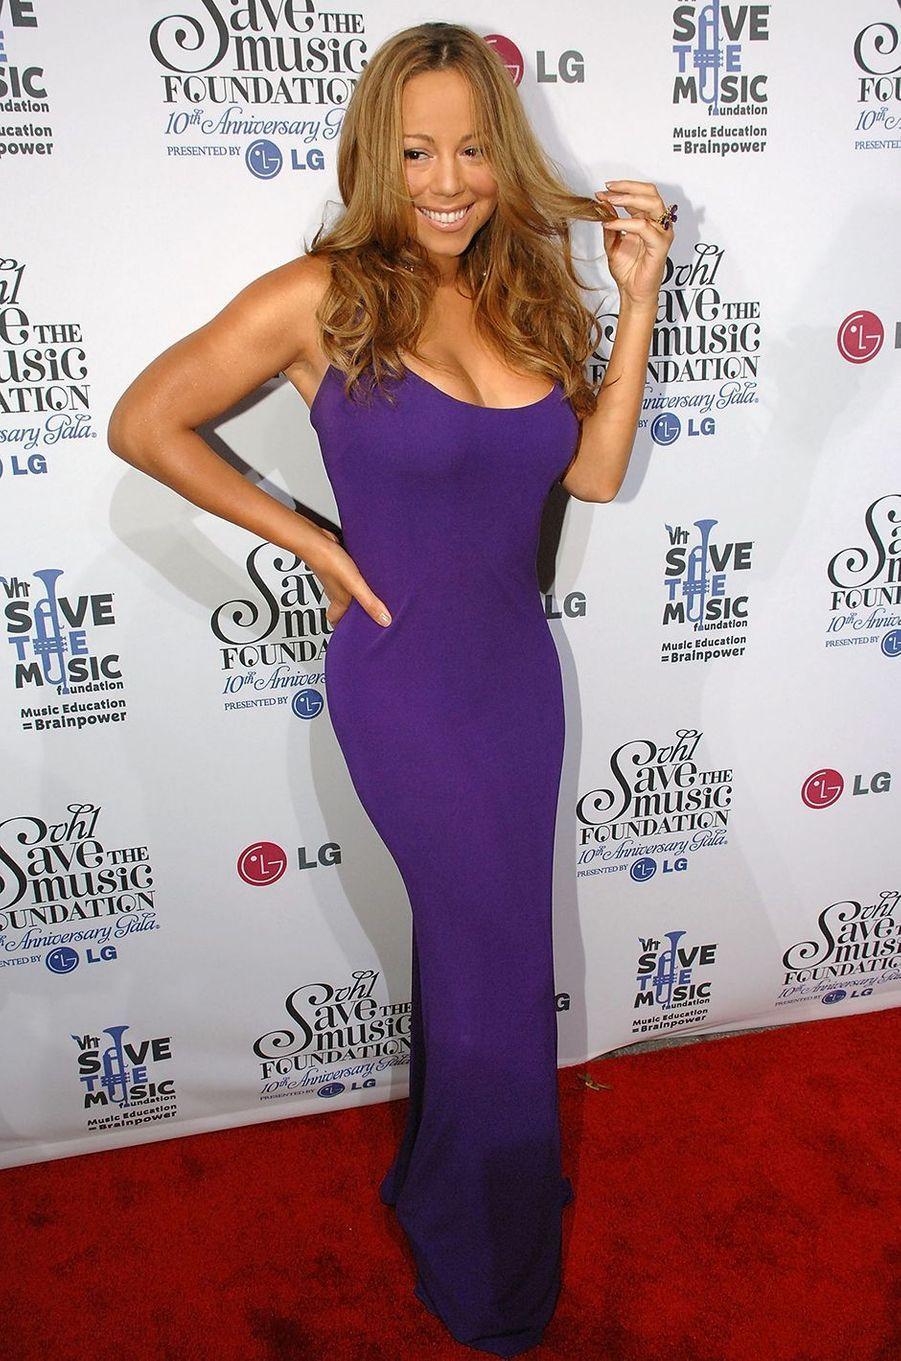 Mariah Carey lors d'un gala à New York le 20 septembre 2007